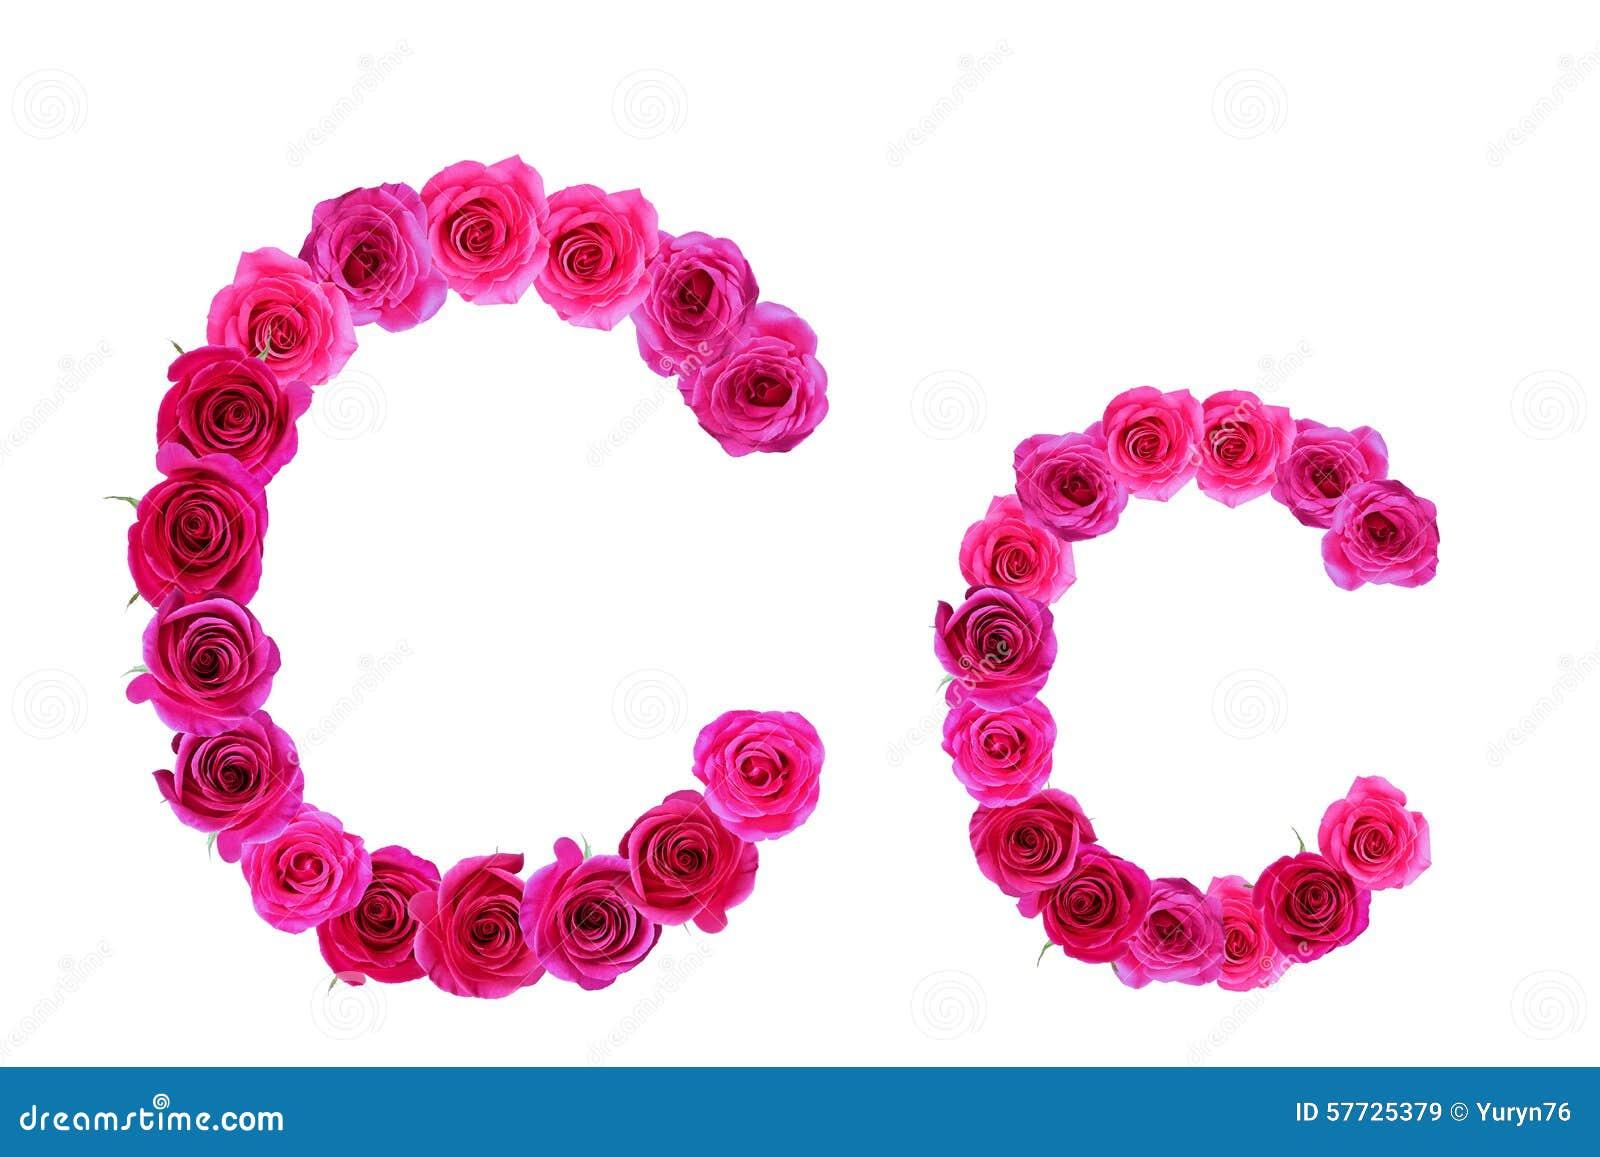 Alphabet Of Roses Stock Photo - Image: 57725379